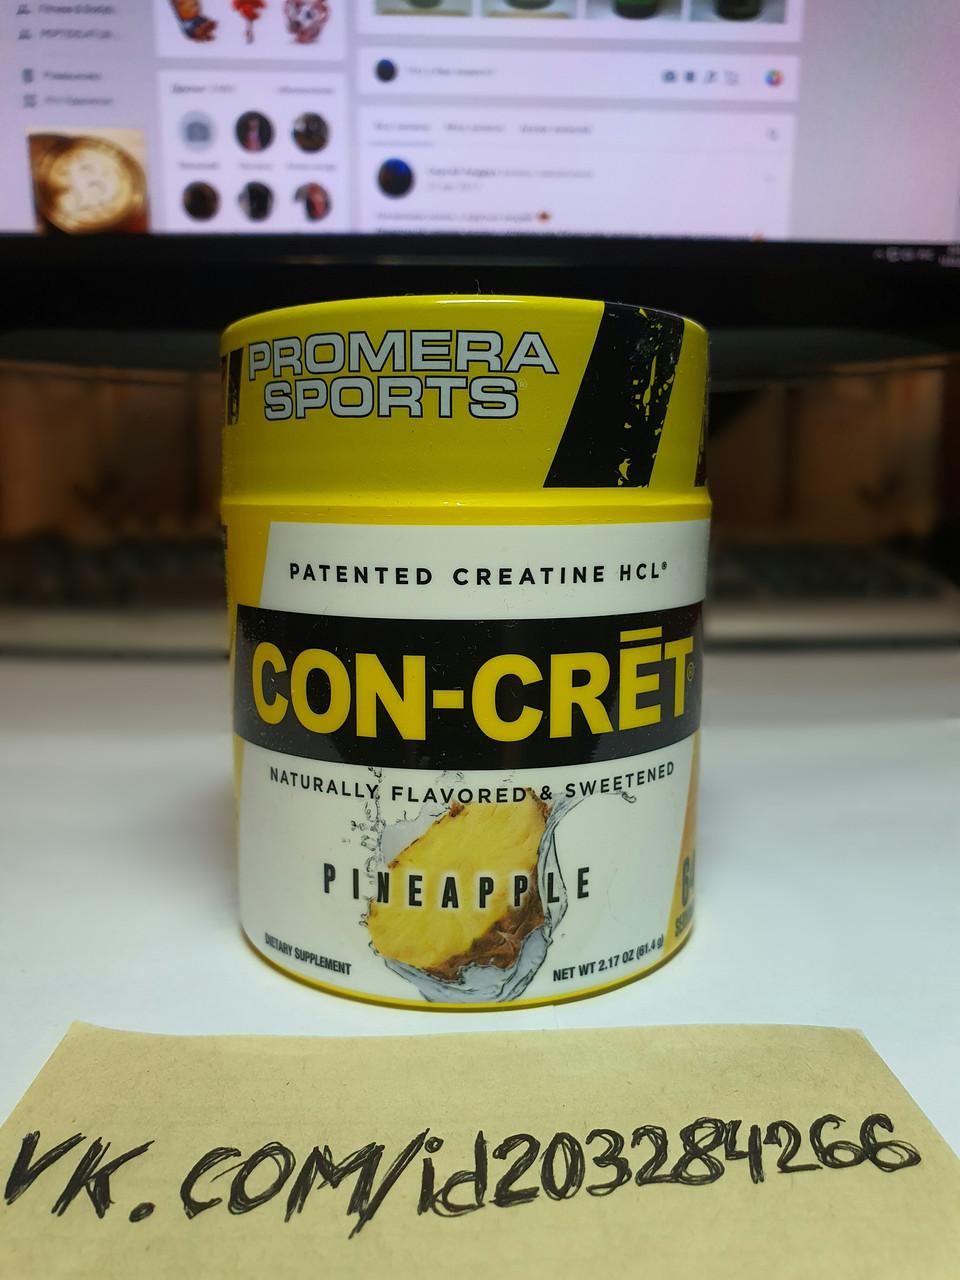 Креатин гидрохлорид ProMera Sports CON-CRET 64 порции промера кон крит hcl